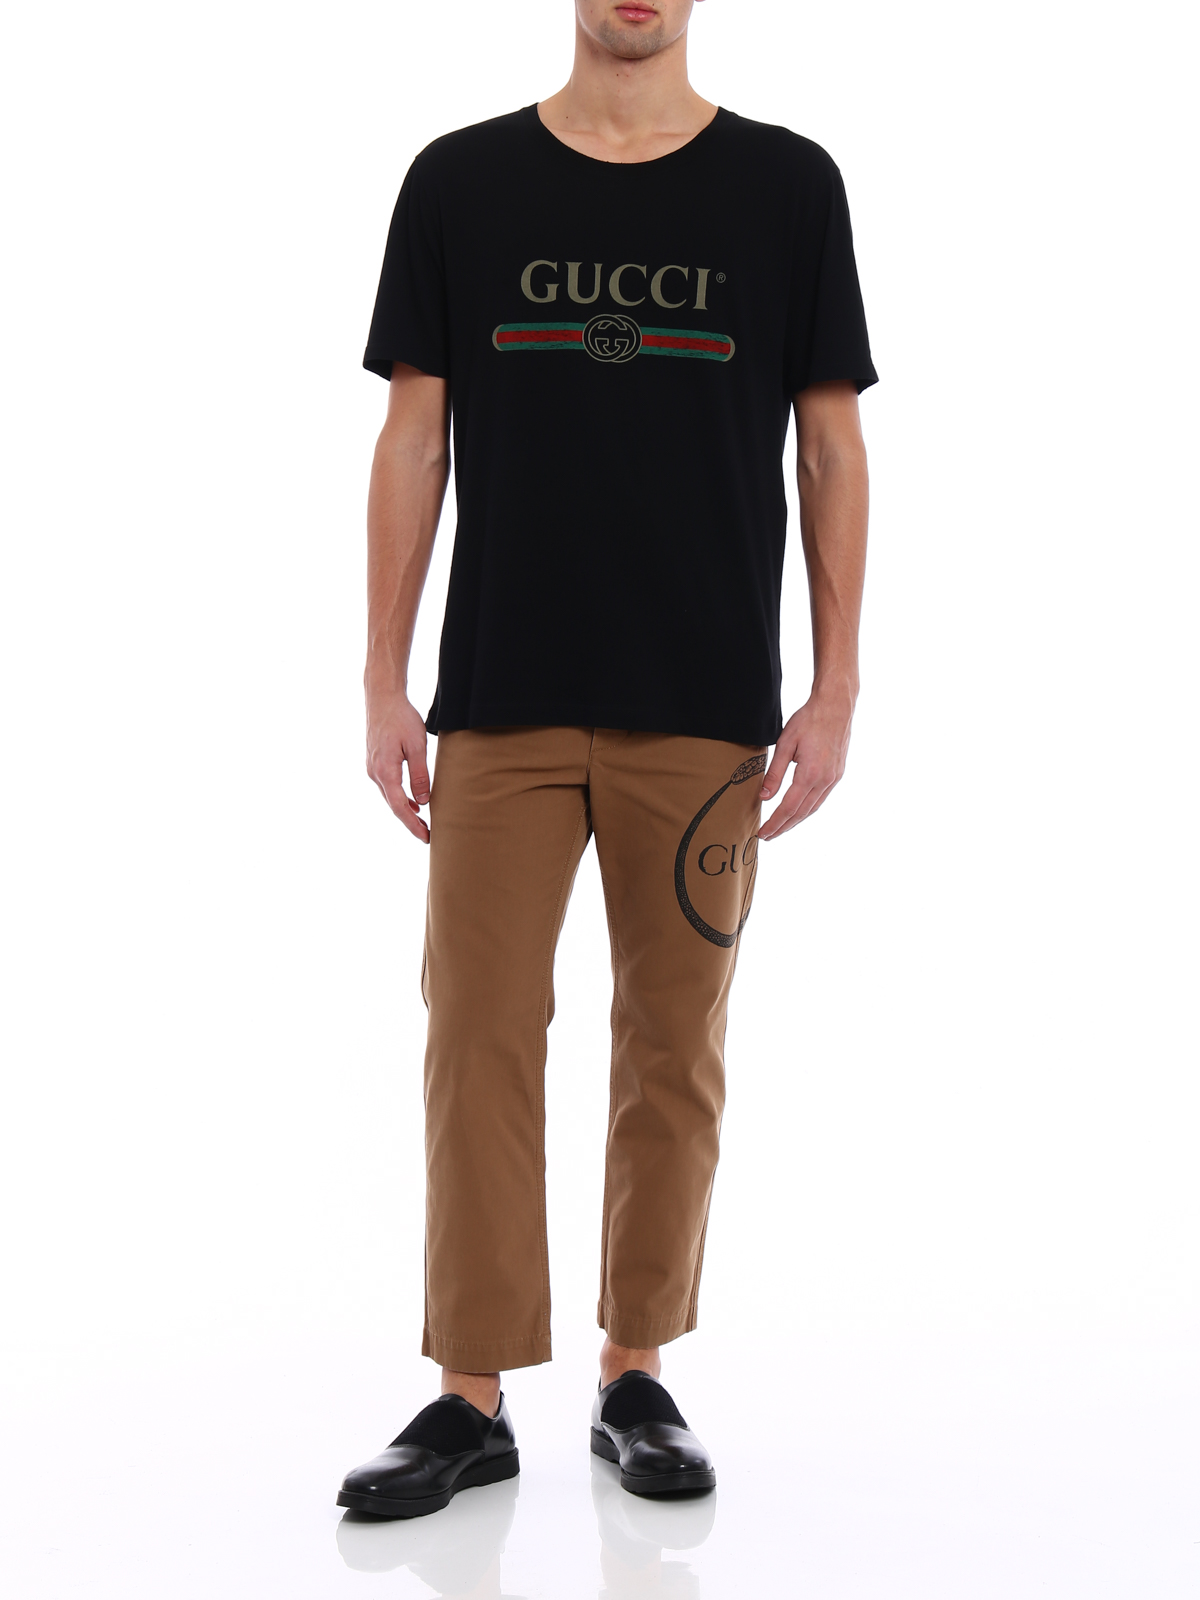 baa2e5f4c Gucci - Signature printed light jersey Tee - t-shirts - 440103 X3F05 ...